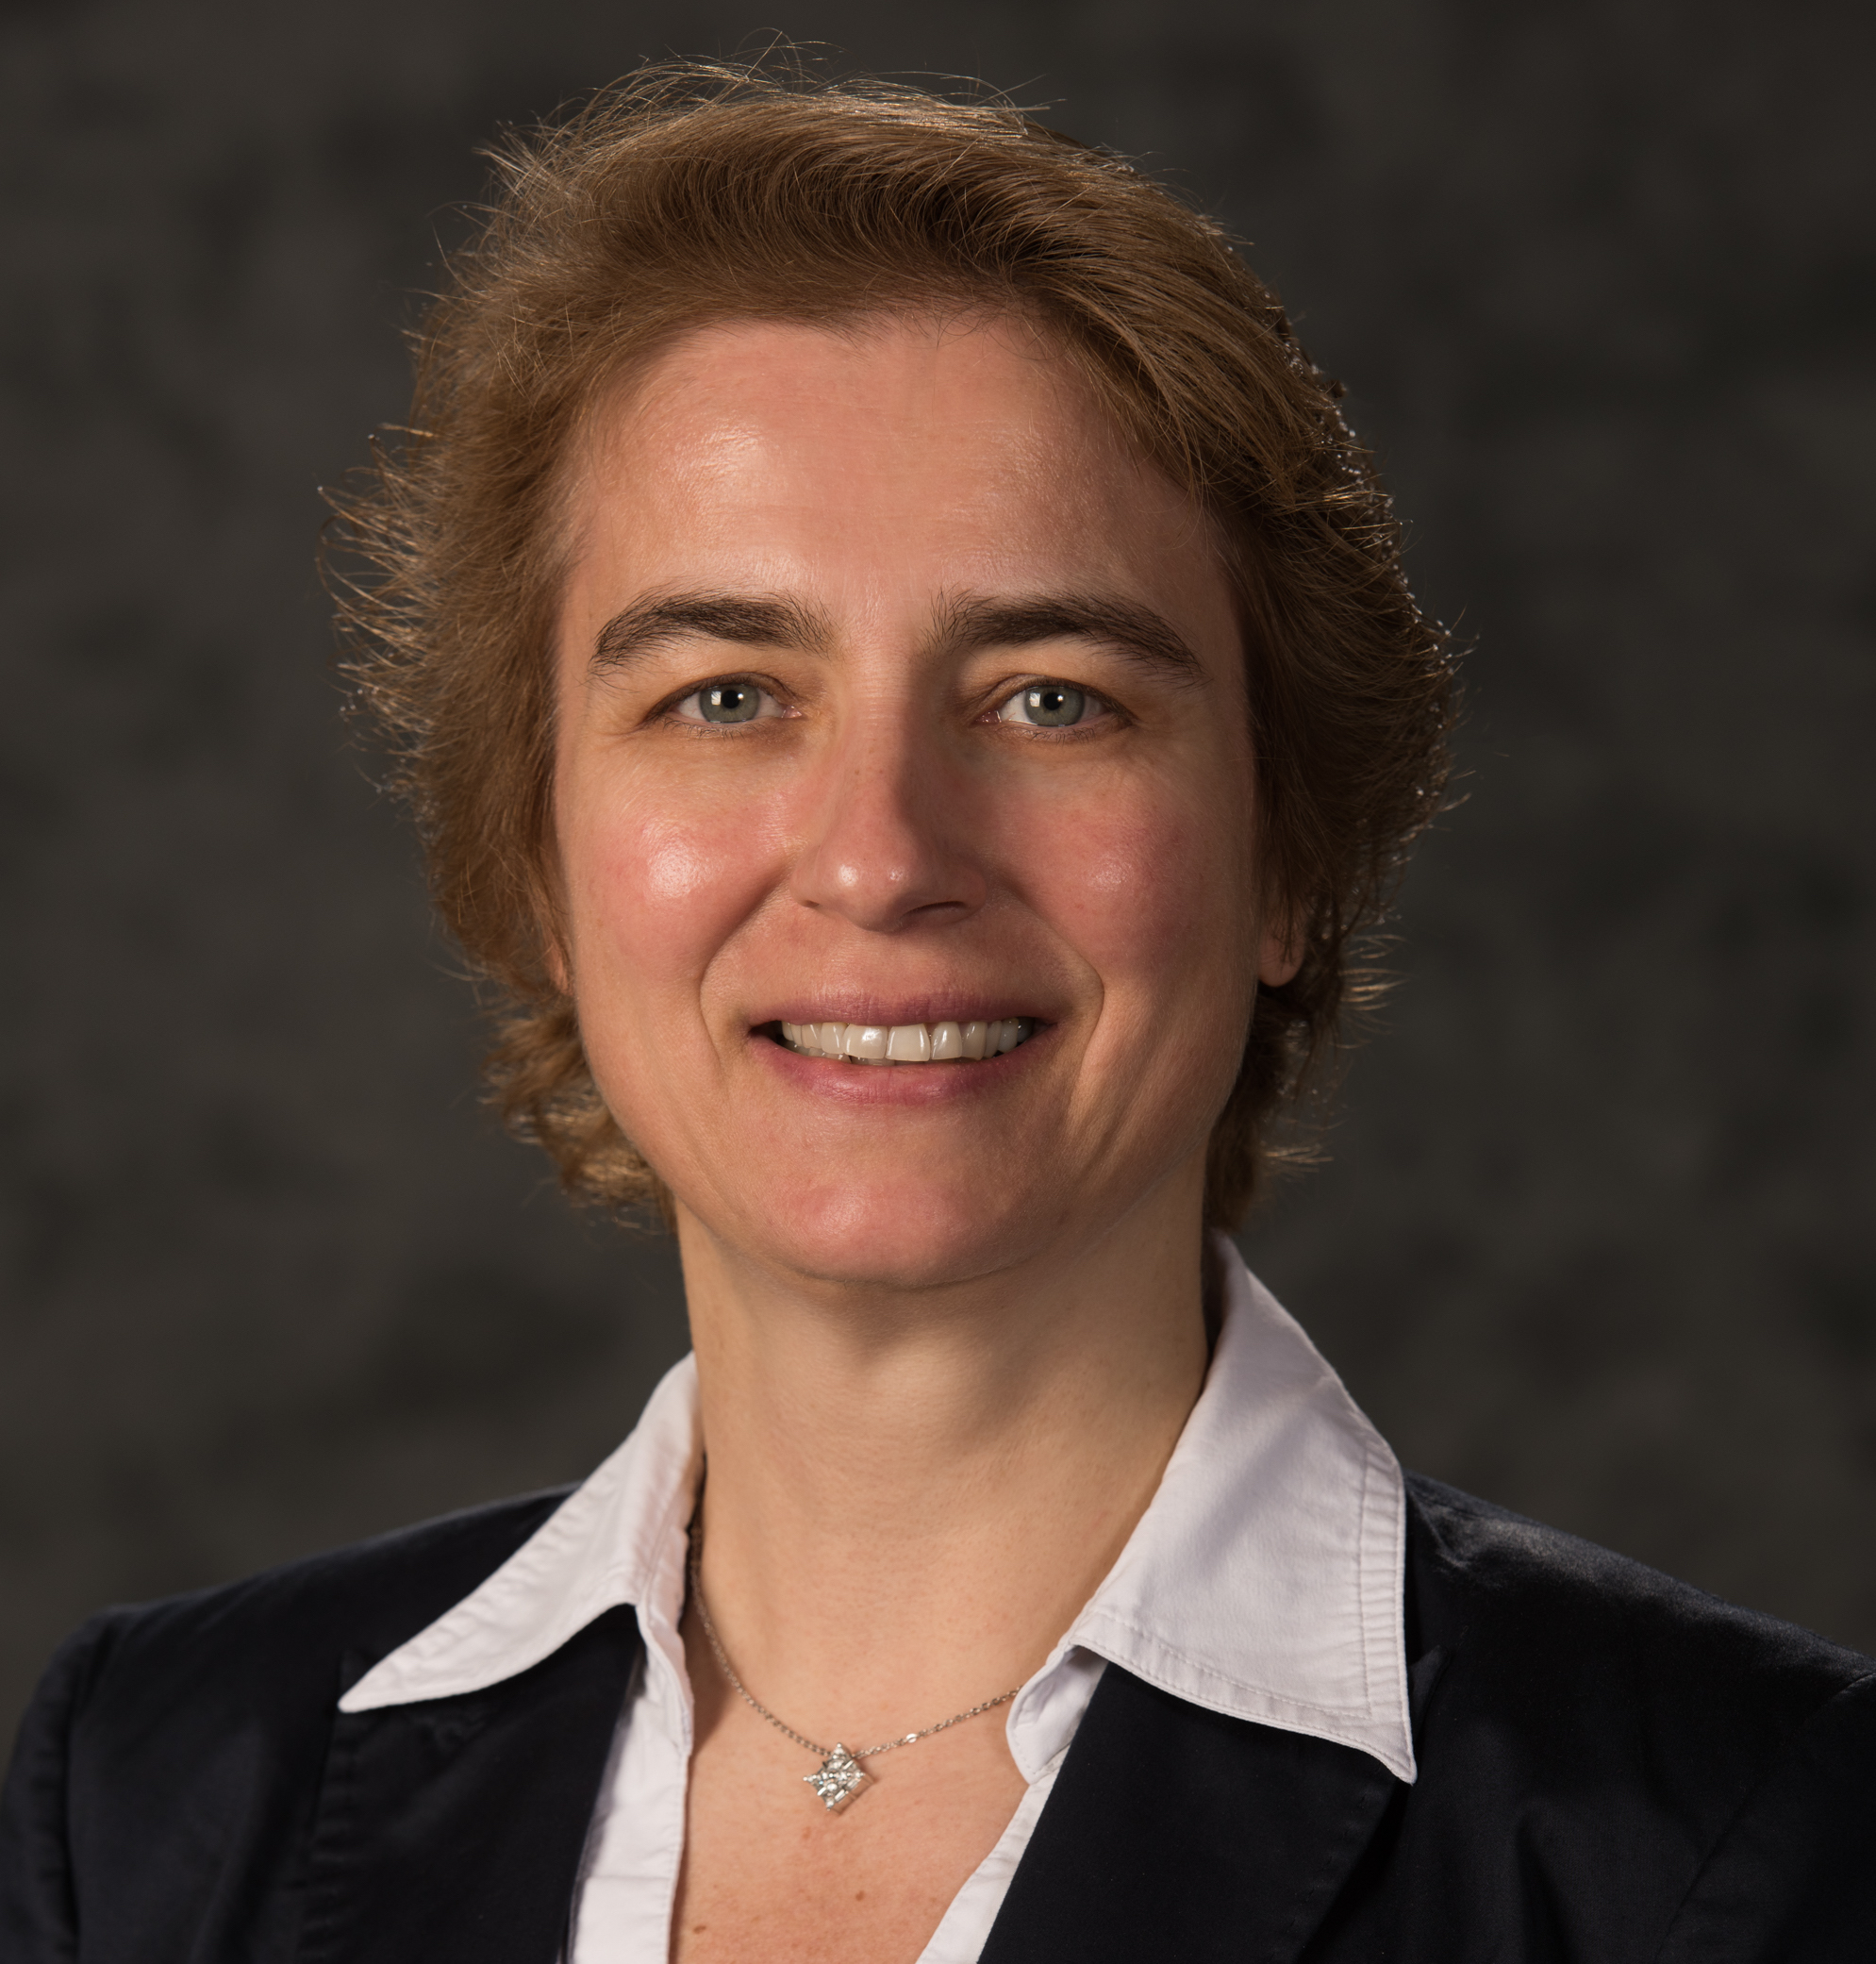 Anja C. Roden, M.D.